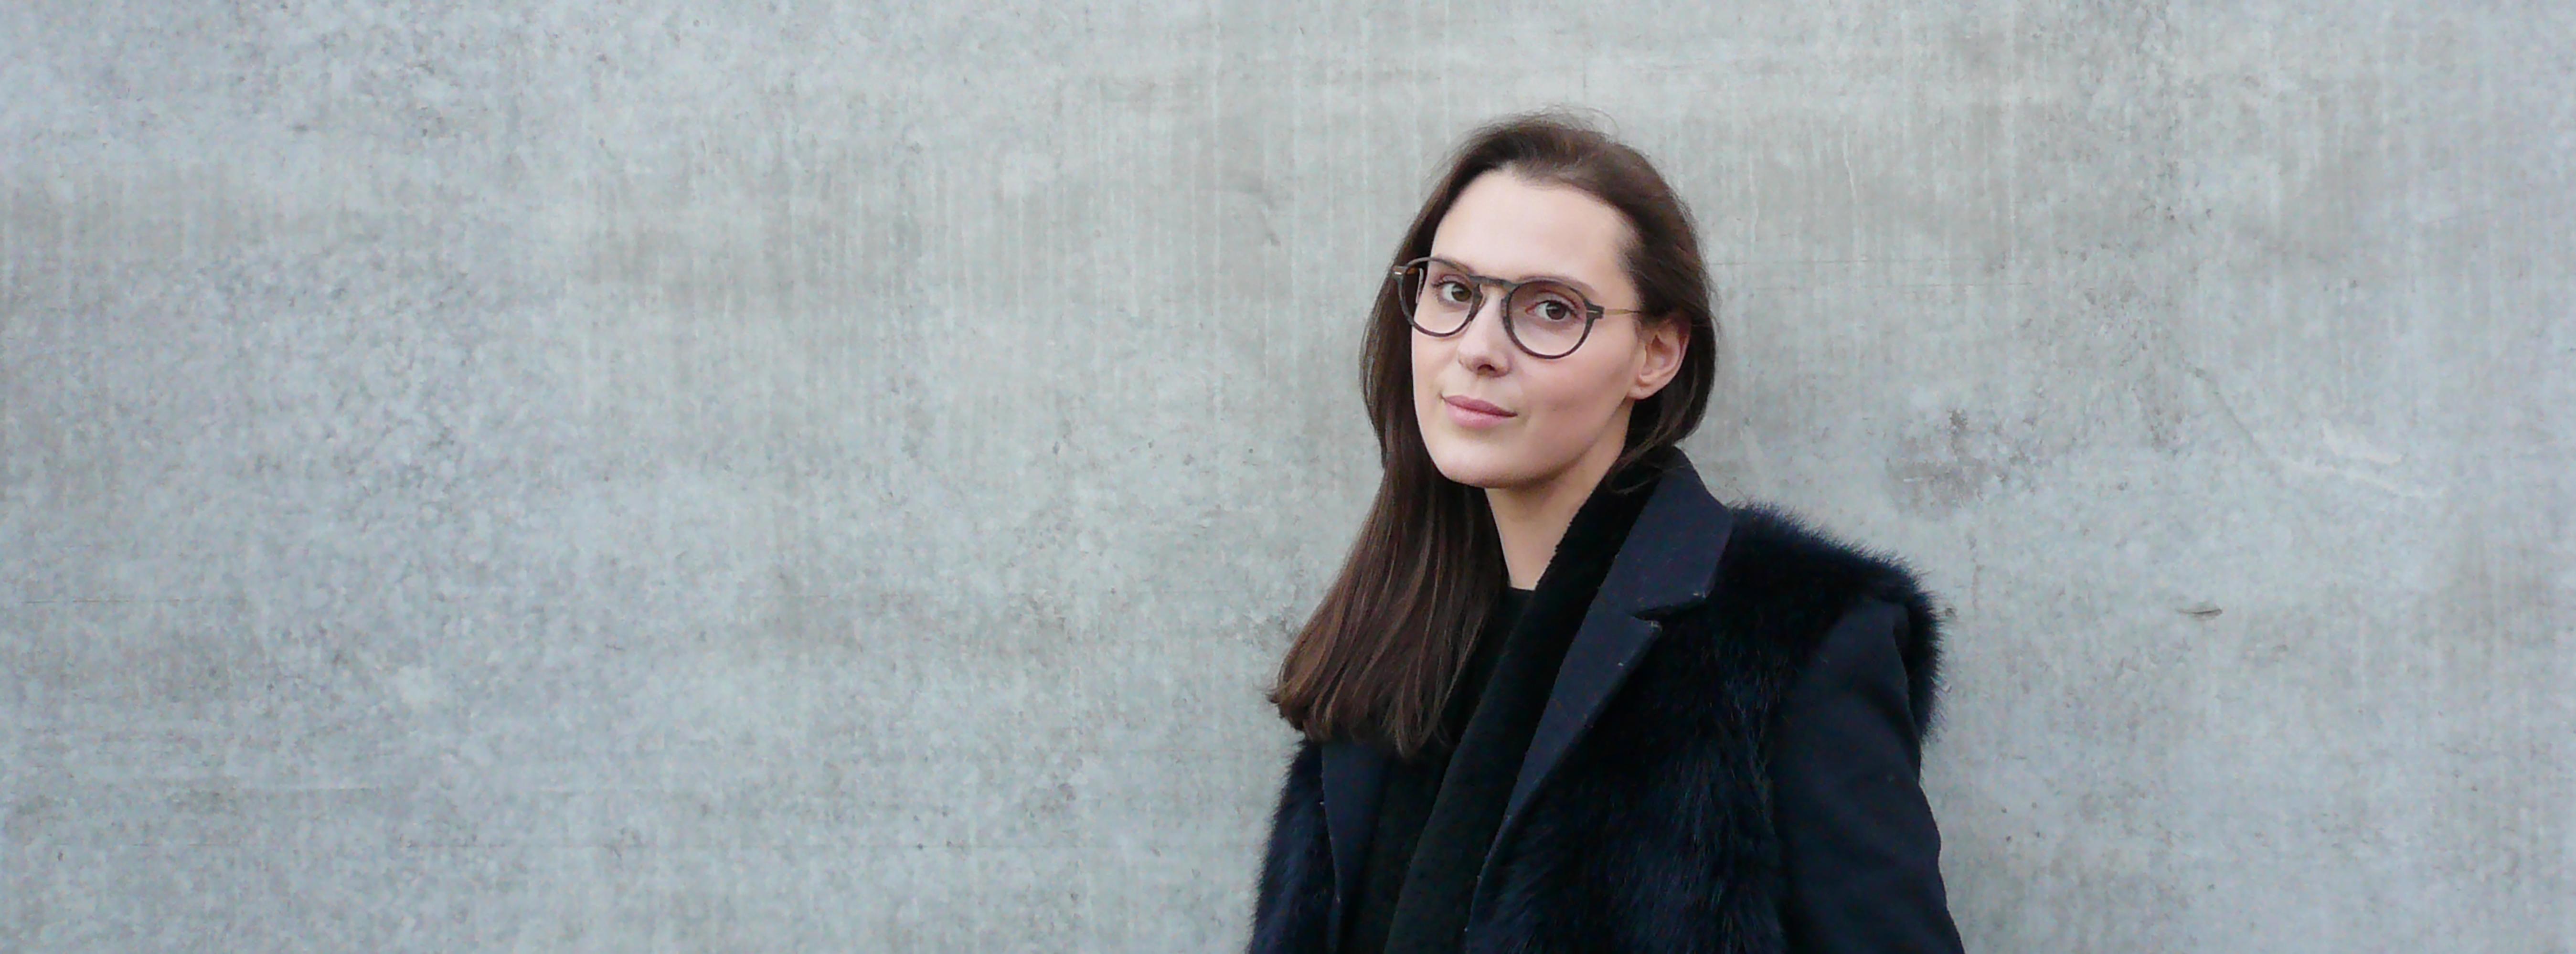 0bceb67912c966 Josfiens top 3 brillen  klein en fijn vs. boyfriend style - Optiek Lammerant